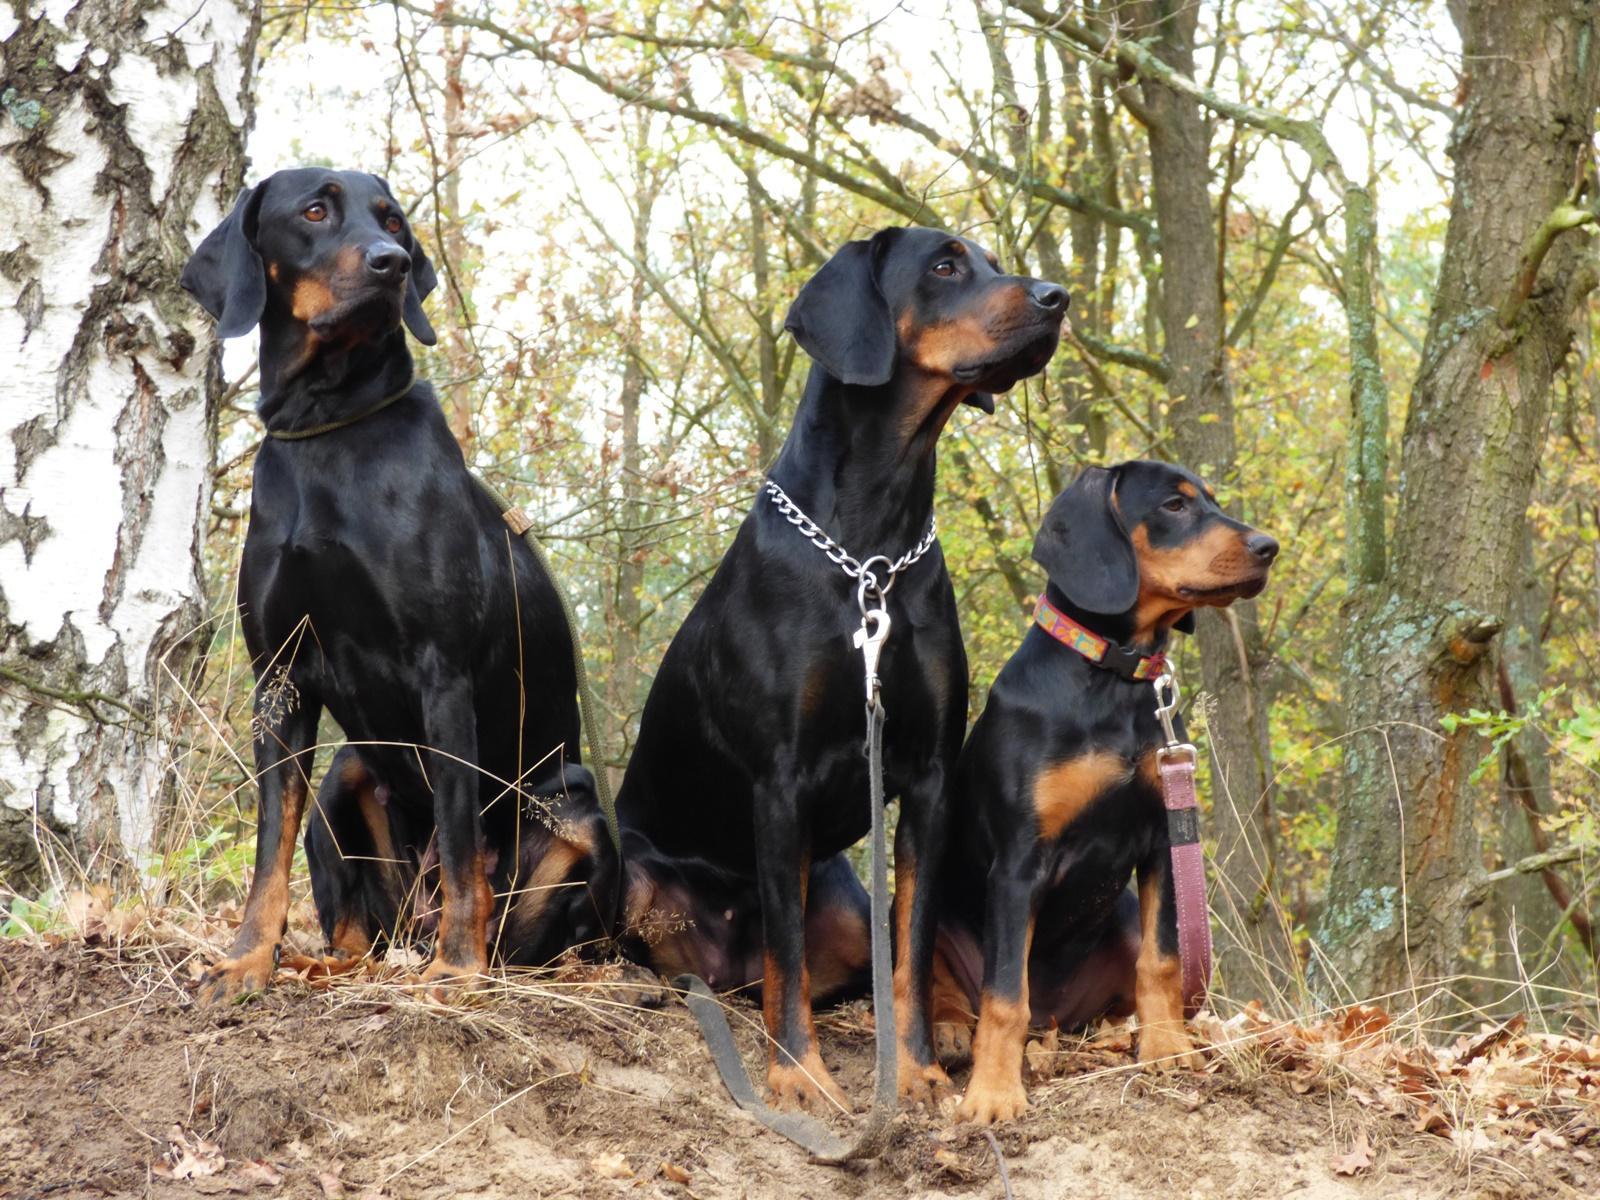 polish hunting dog wallpapers hd download